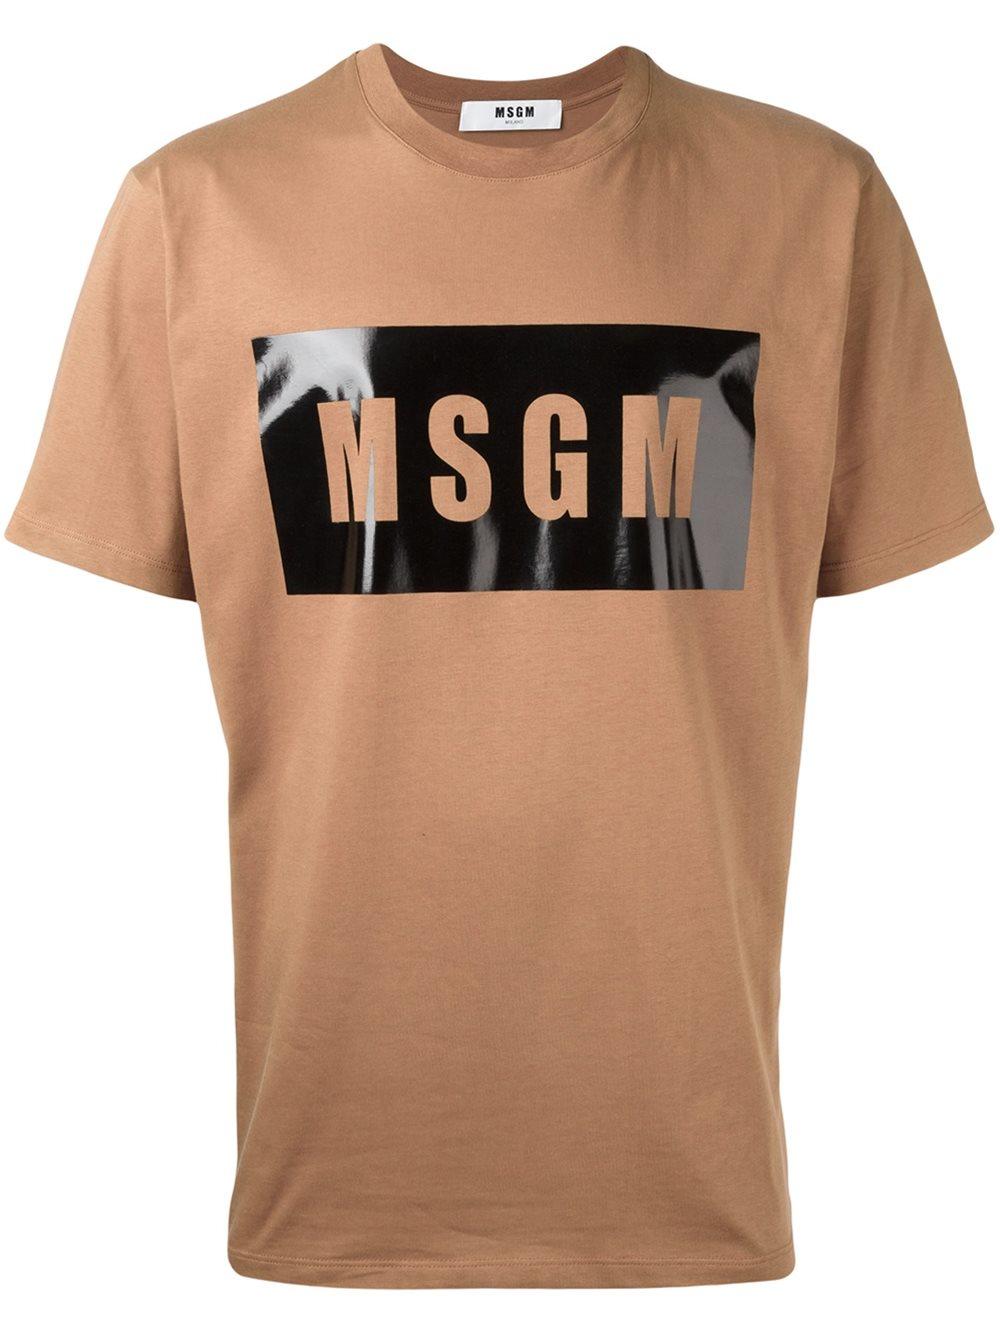 Msgm logo print t shirt in brown for men lyst for Print logo on shirt